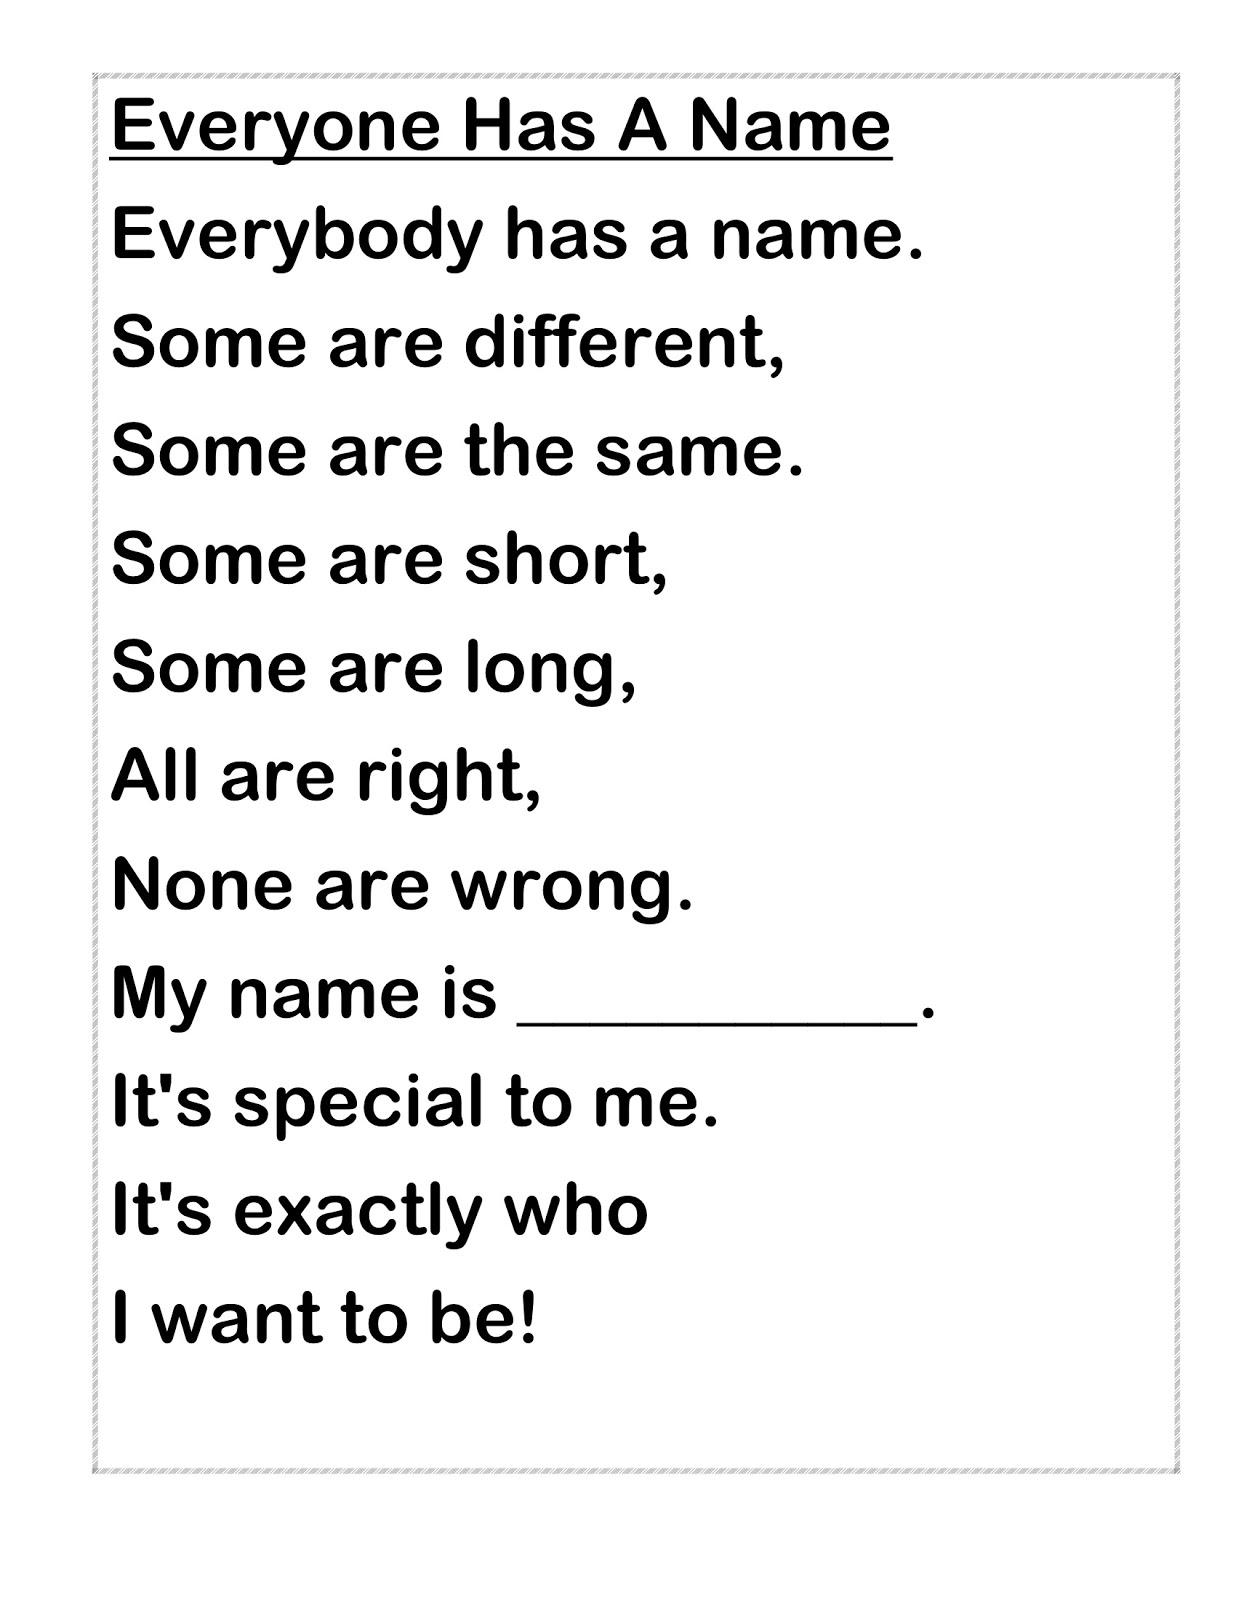 English Class - Poem by Julius Rembrandt